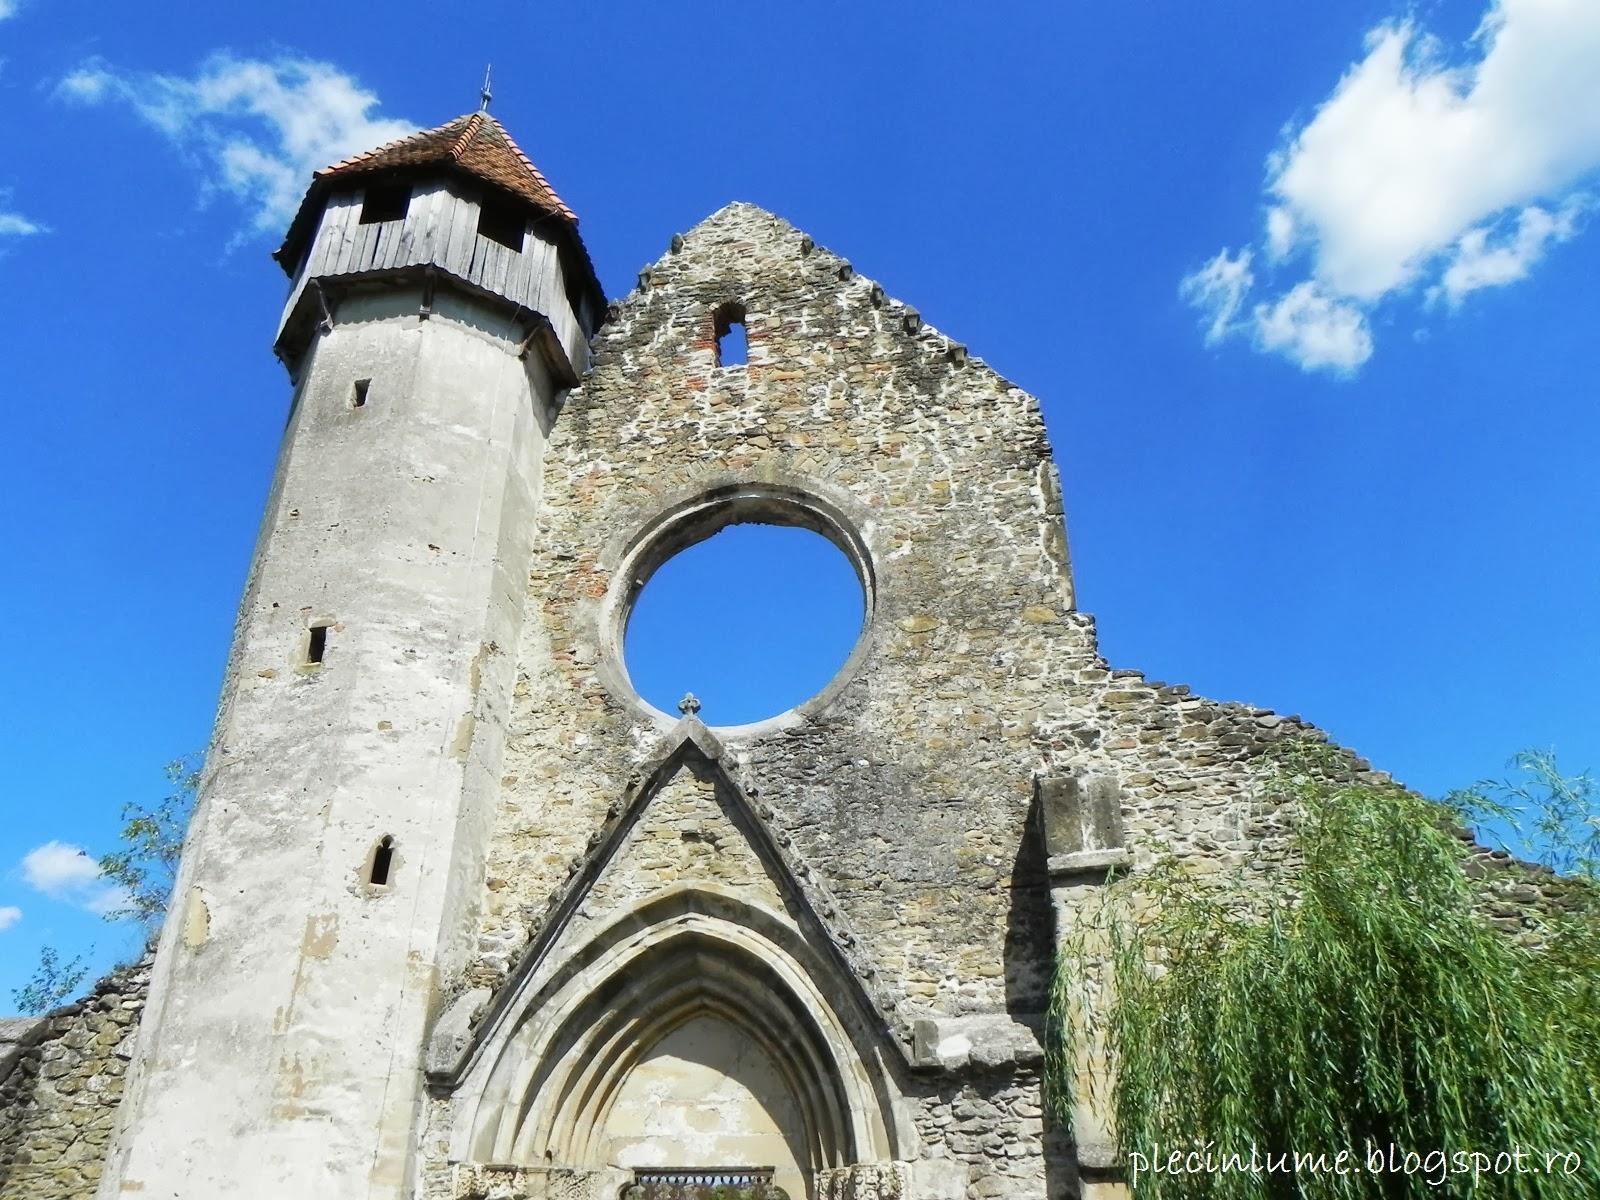 Ruinele manastirii cisterciene din Carta